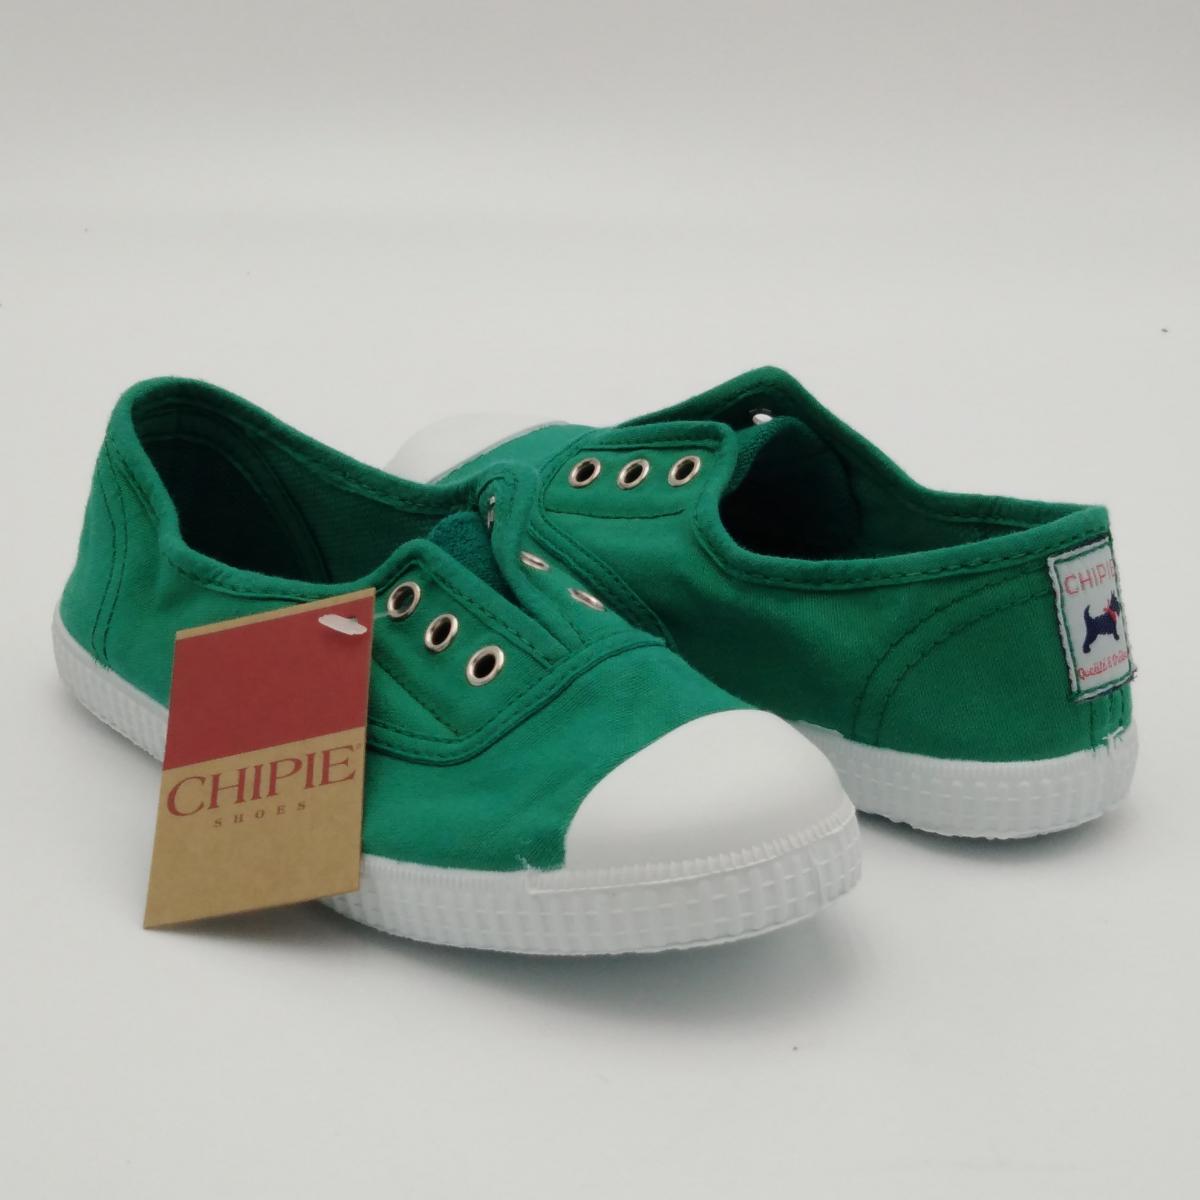 Chipie Shoes Josepe -Slip...